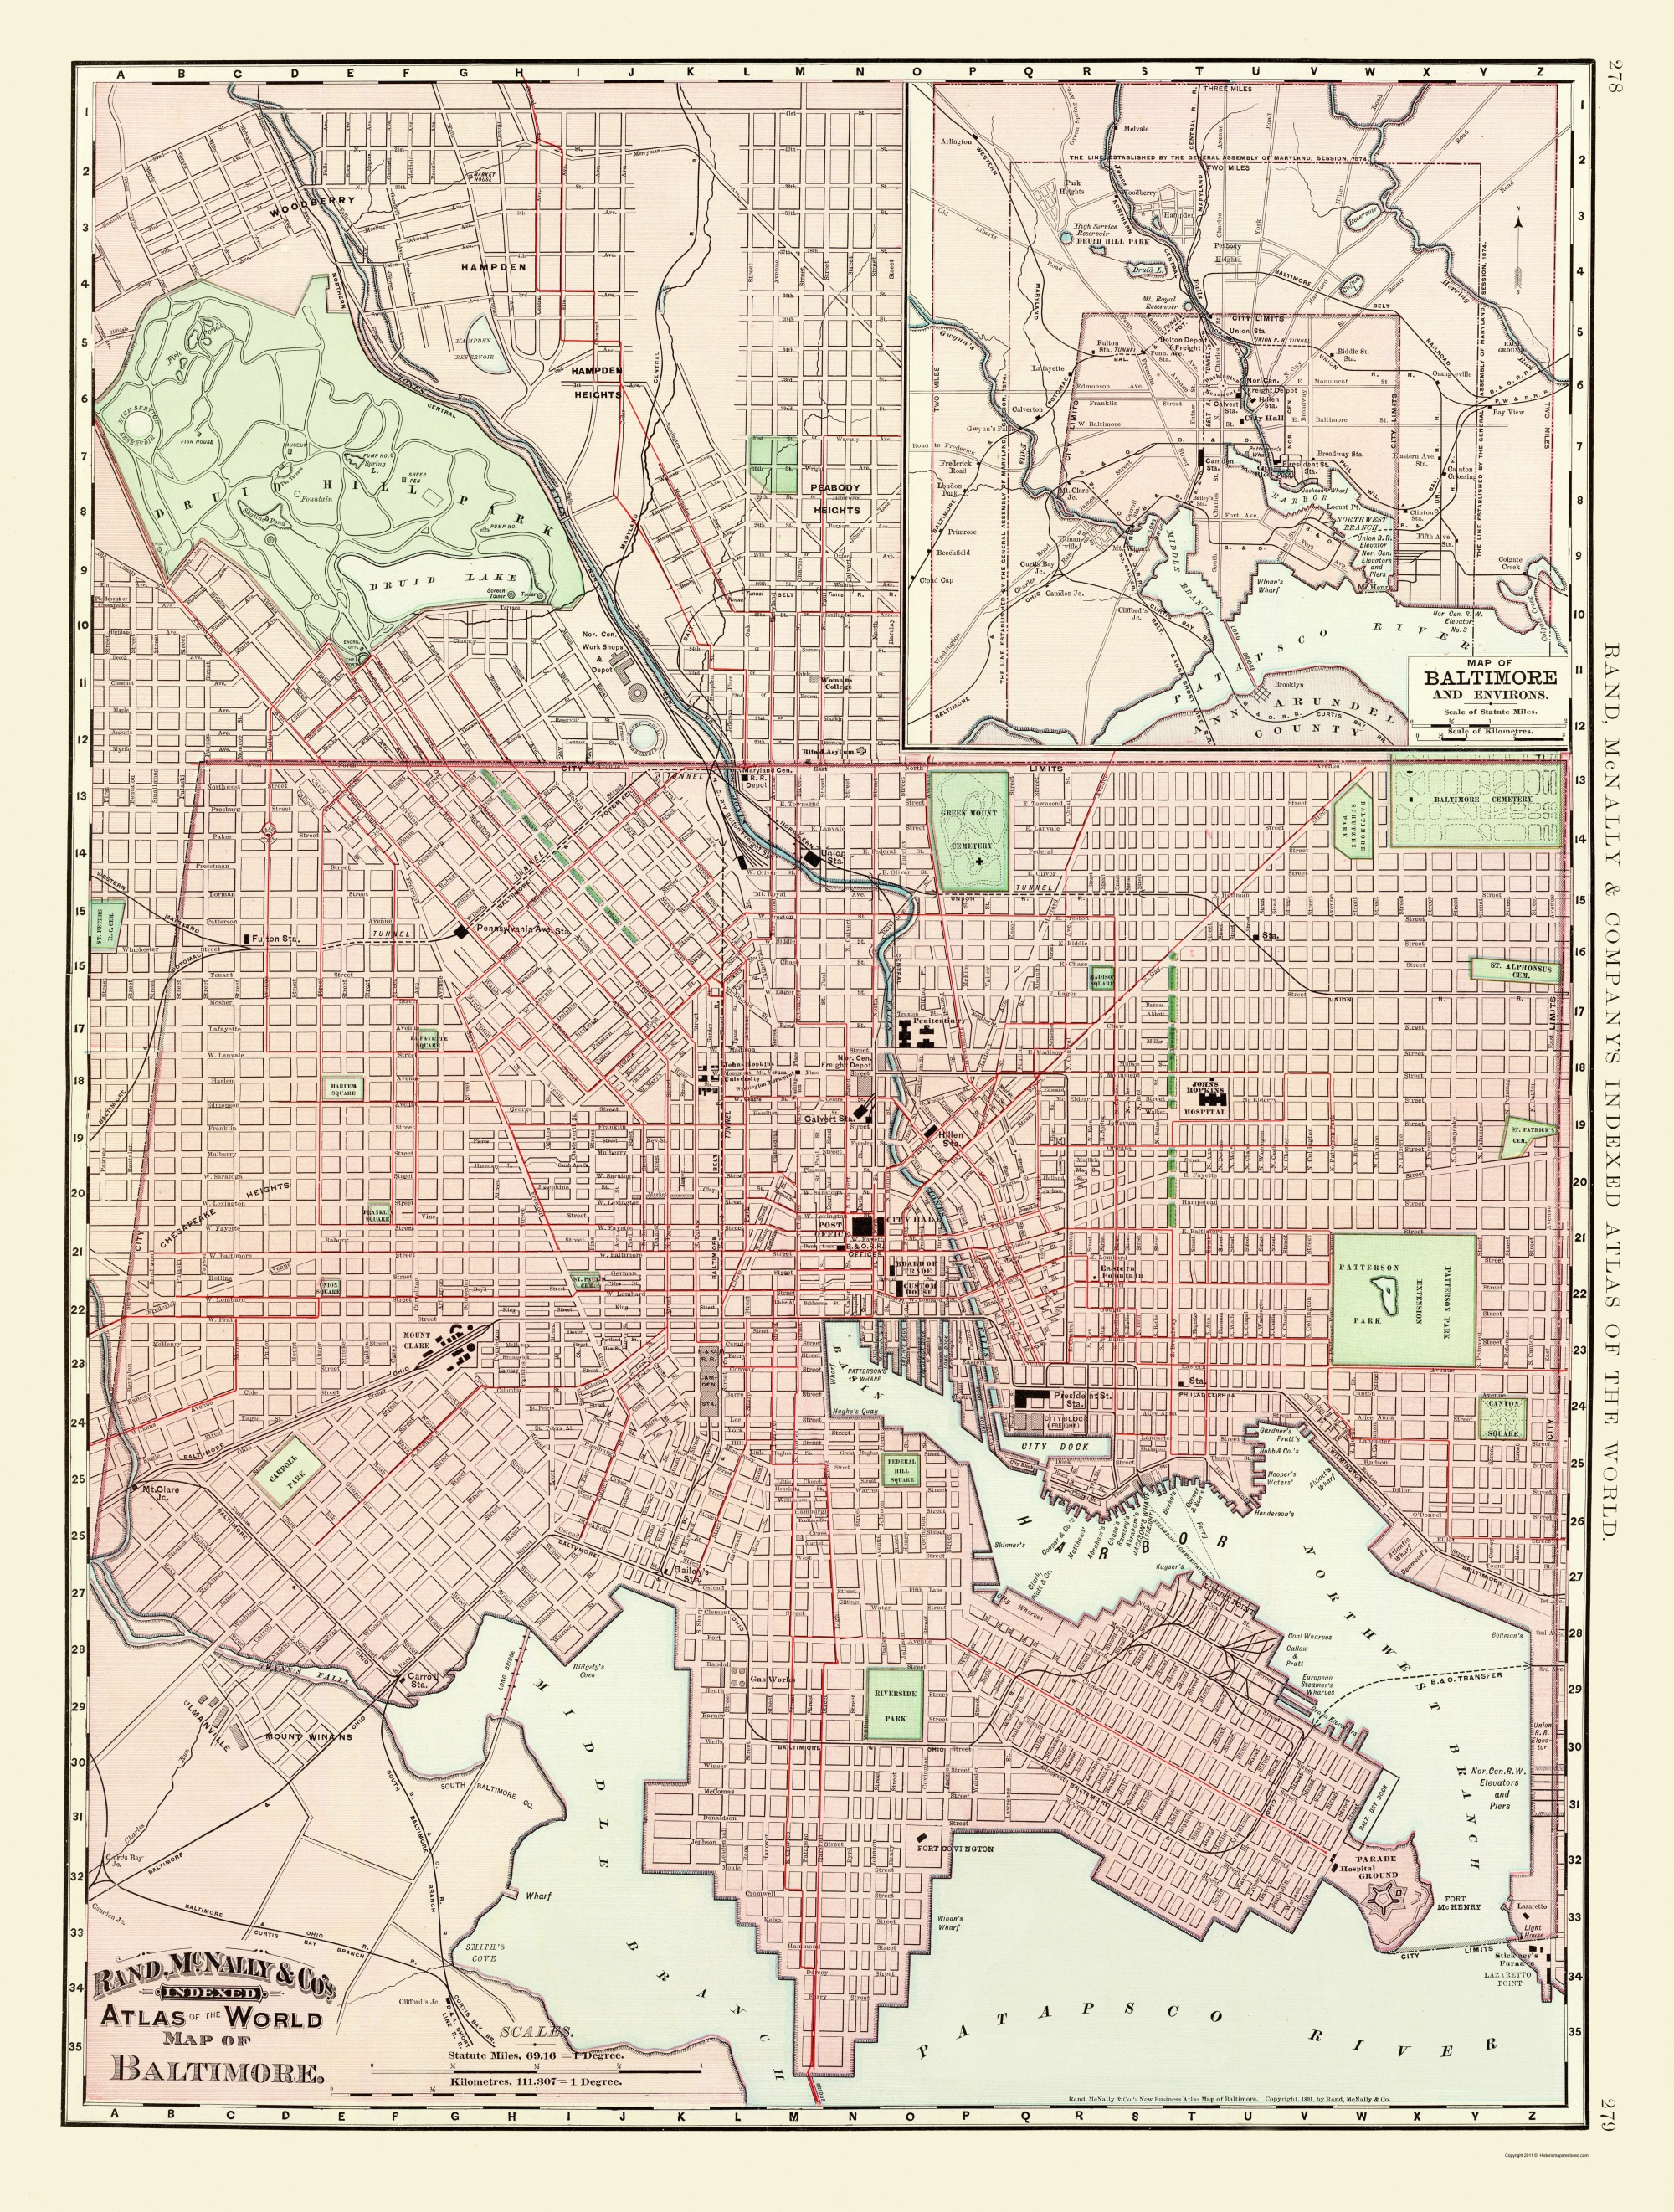 Baltimore Maryland - Rand McNally 1897 - 23 x 30.39